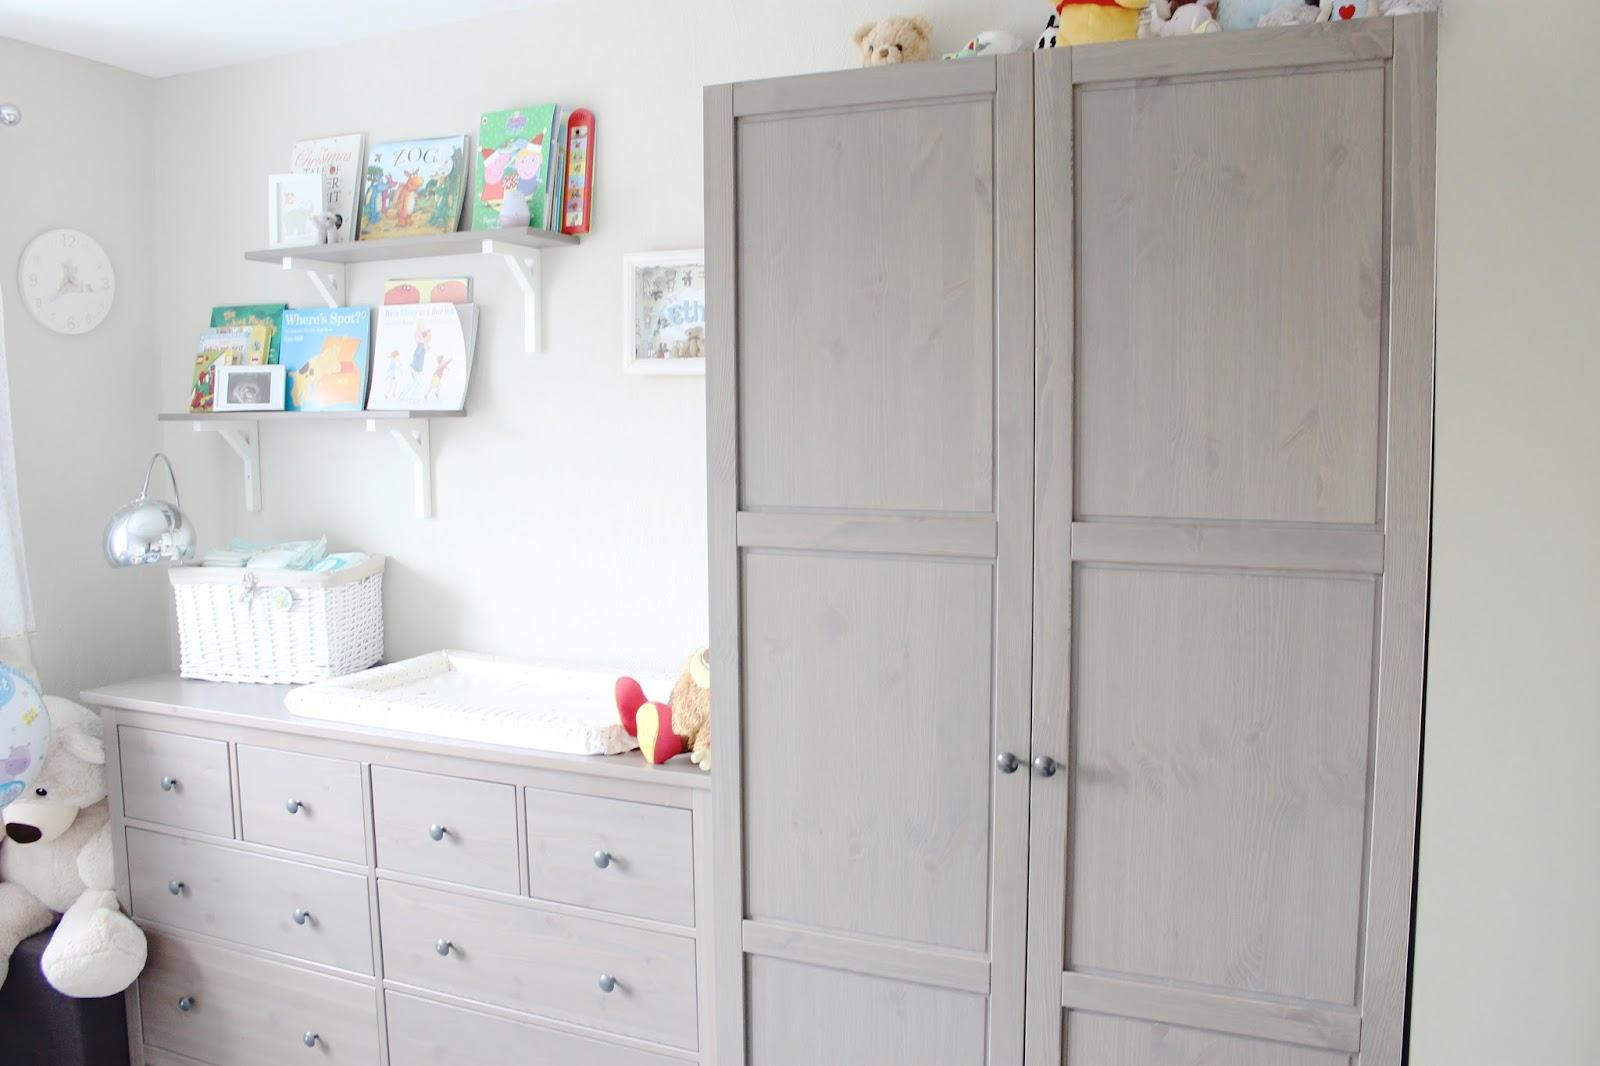 6 Lovely Wall Art Ideas For Your Baby S Nursery Room Alex Gladwin